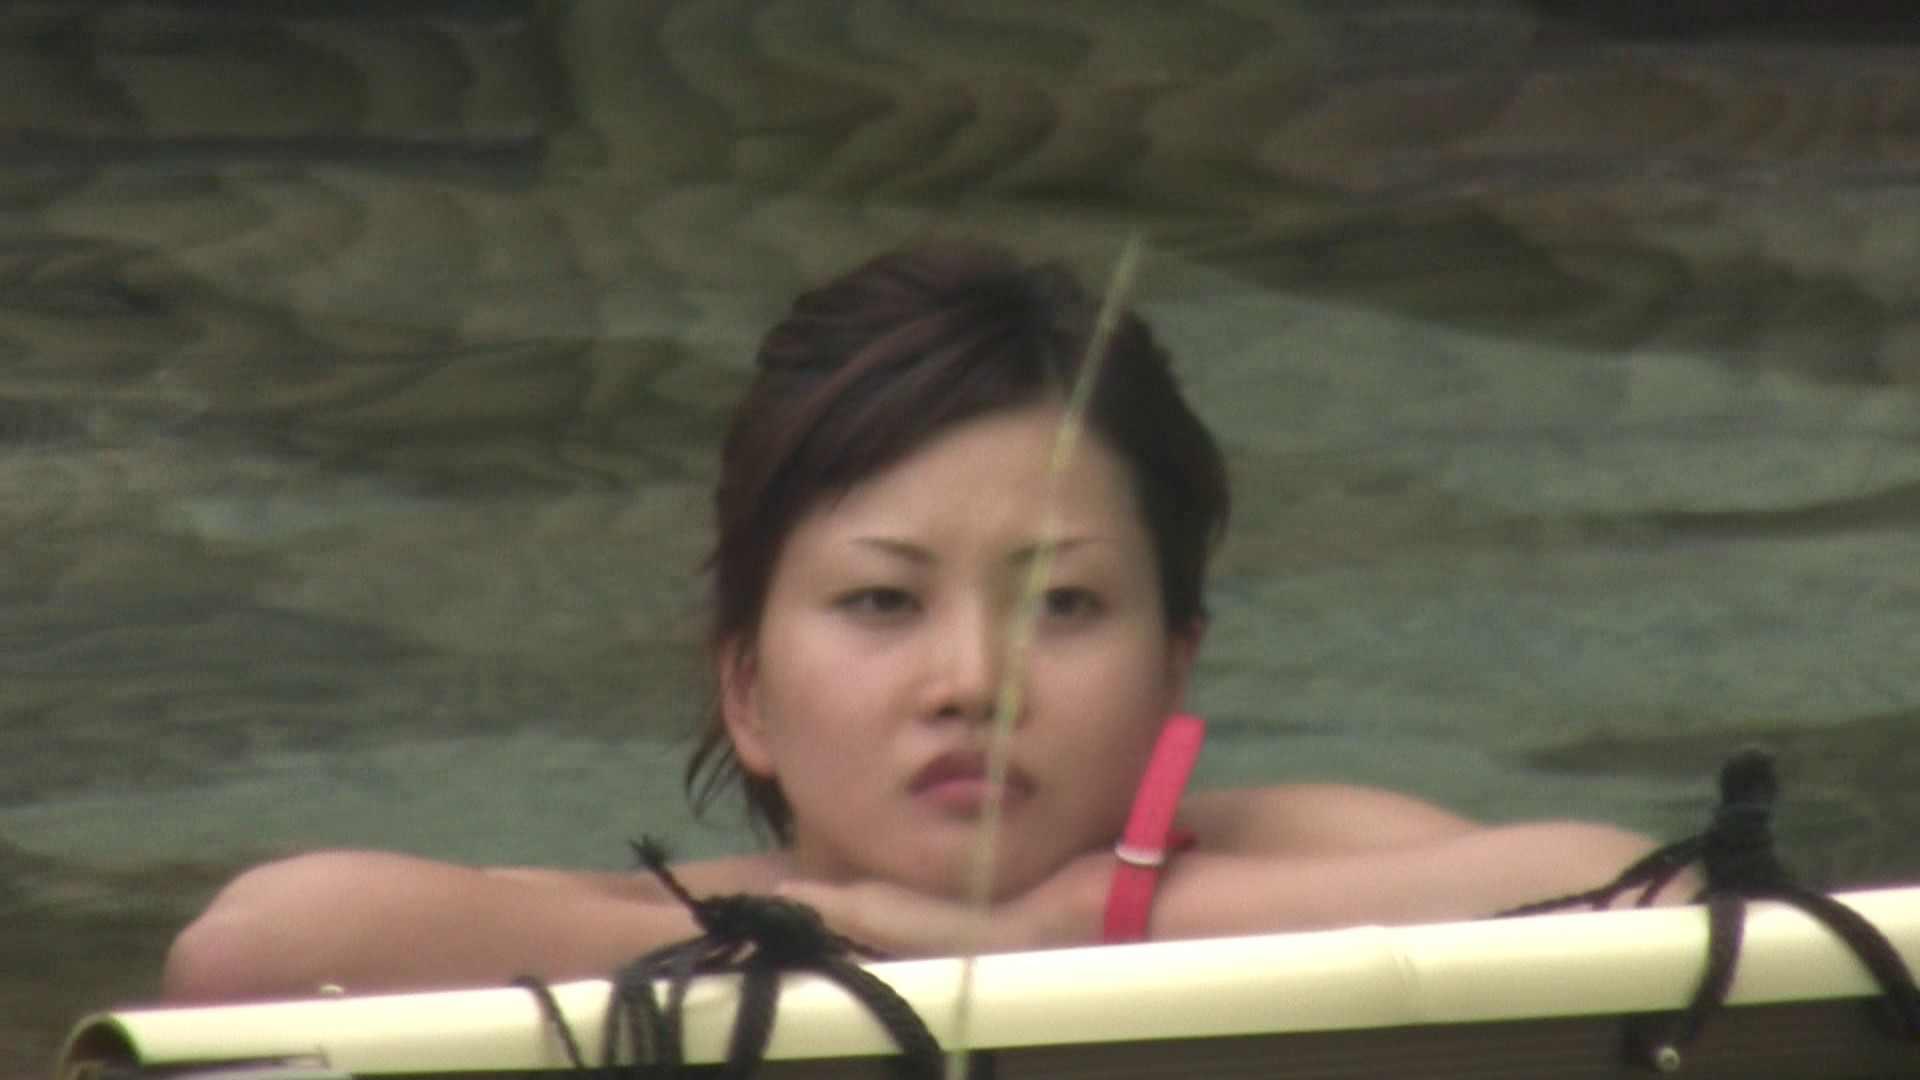 Aquaな露天風呂Vol.125 0 | 0  26連発 1